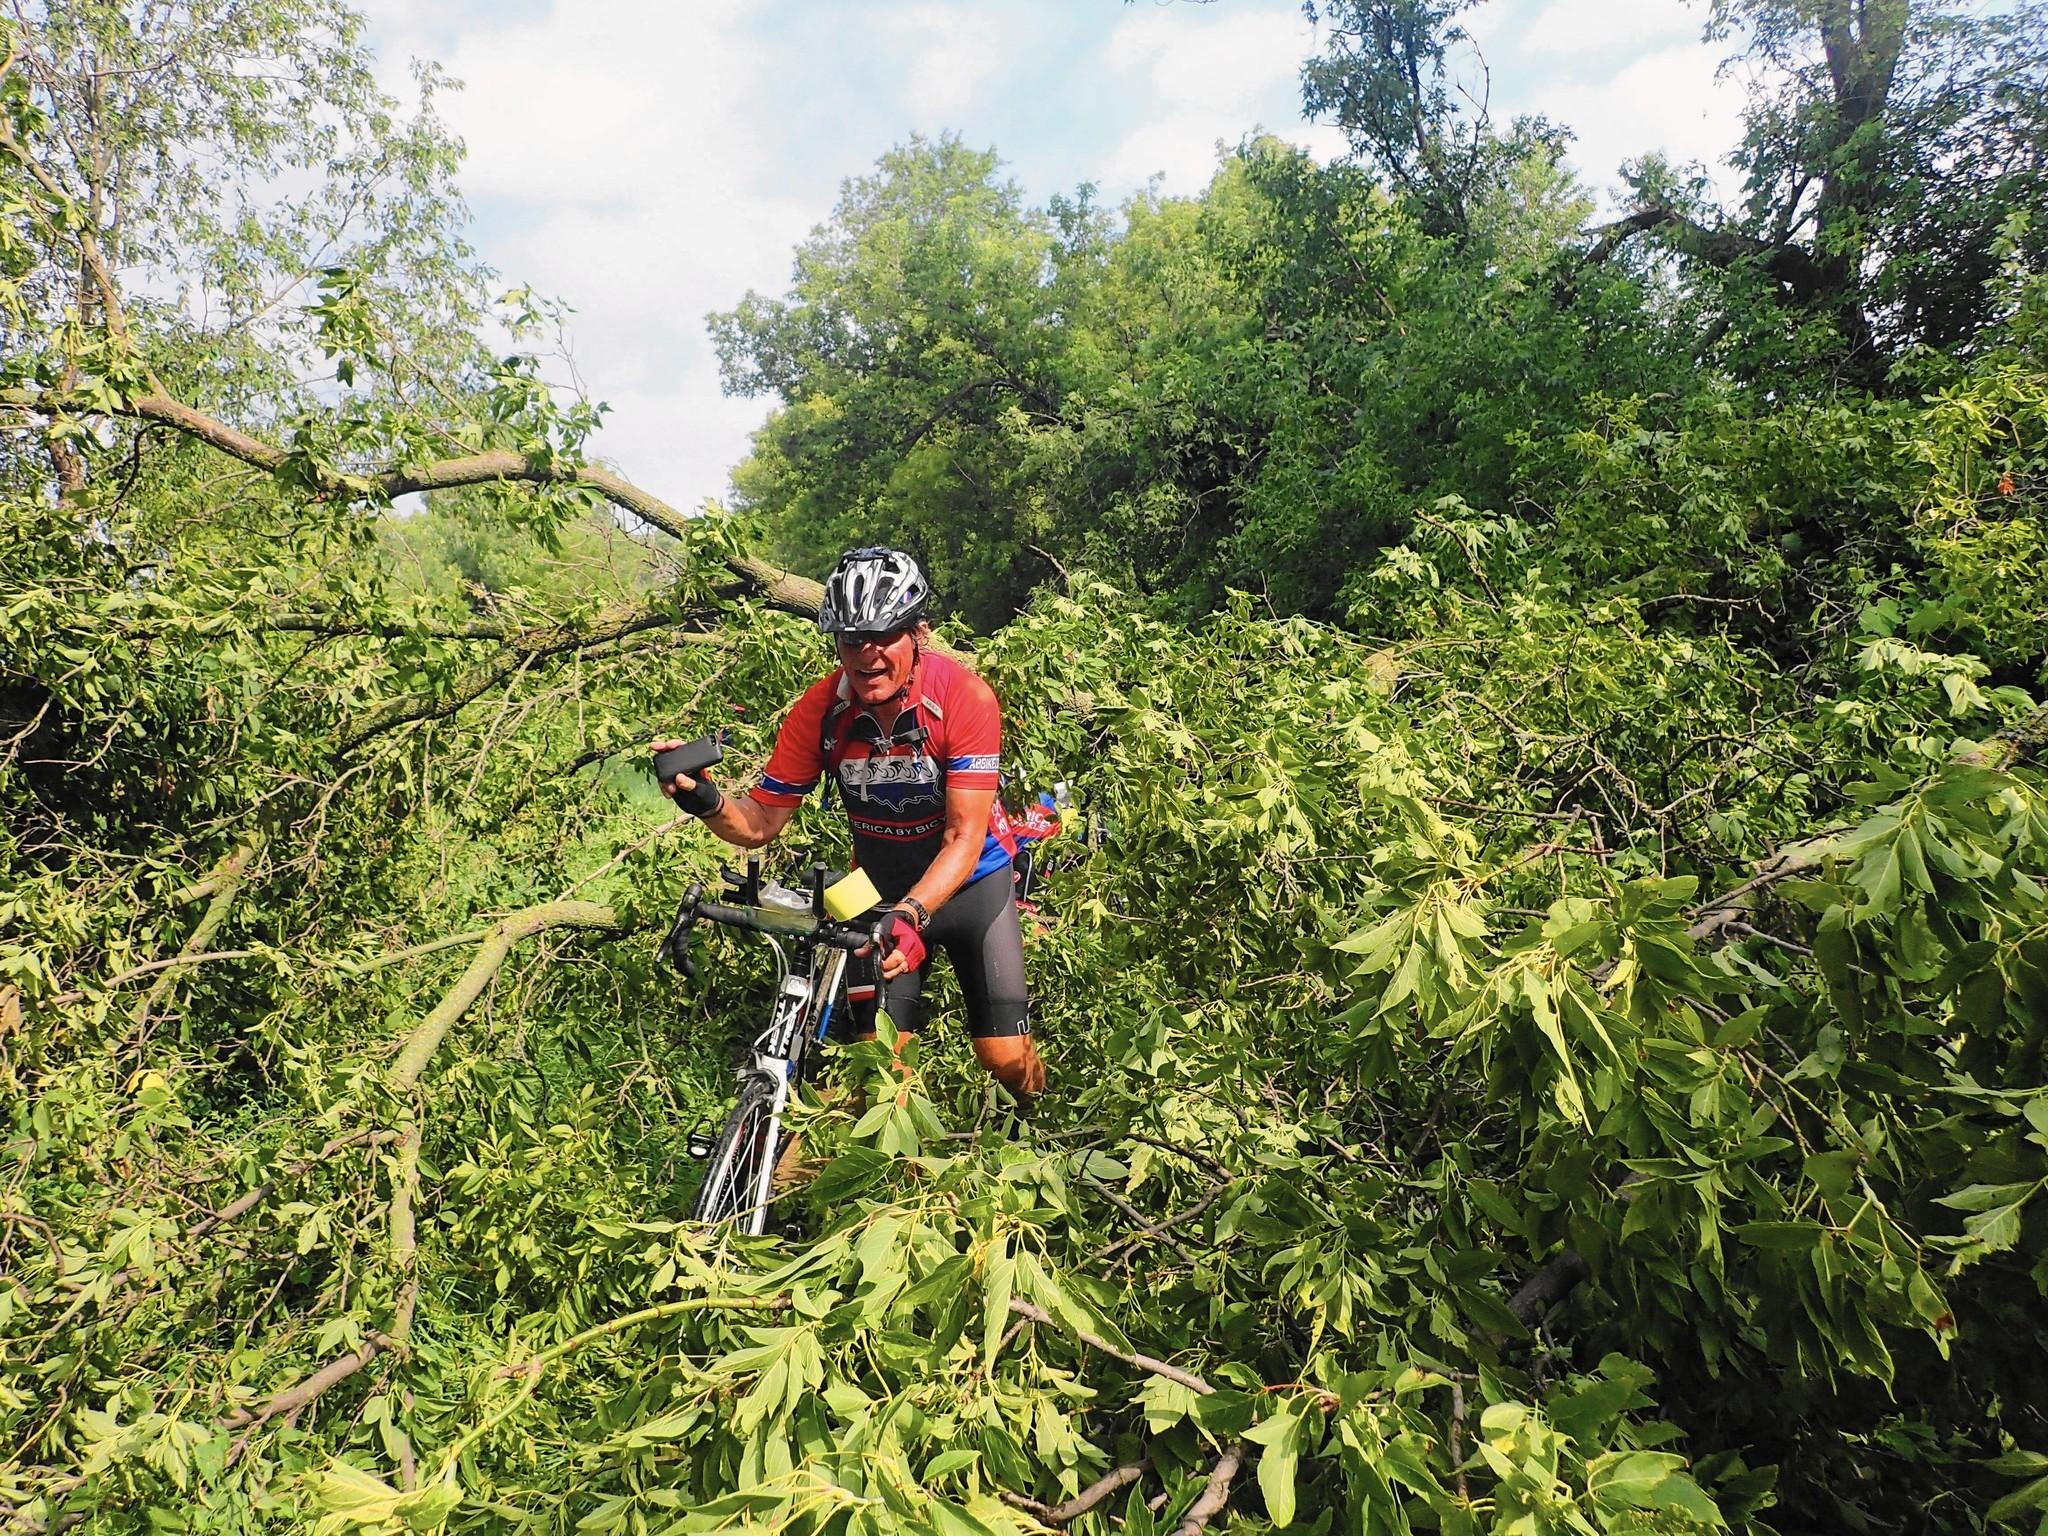 Racking up miles, memories on cross-country bike adventure